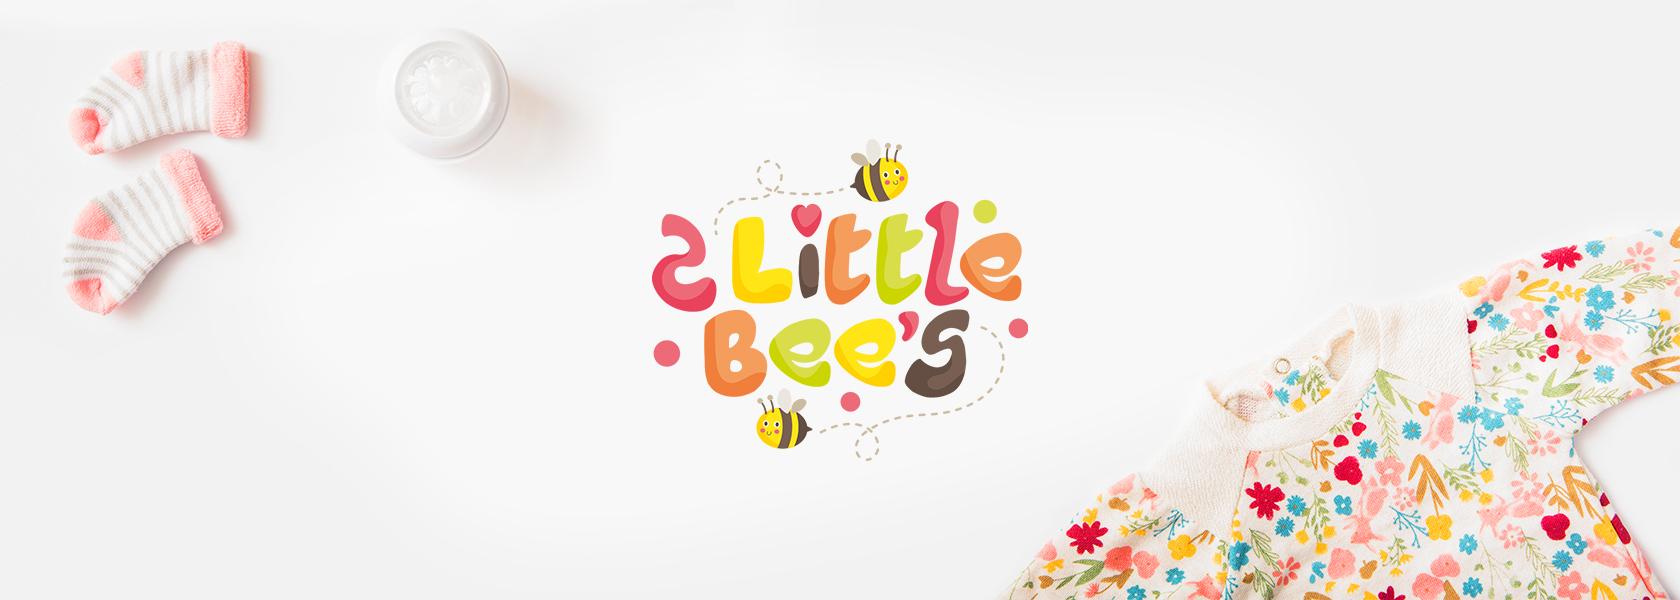 2 little bees разработка логотипа